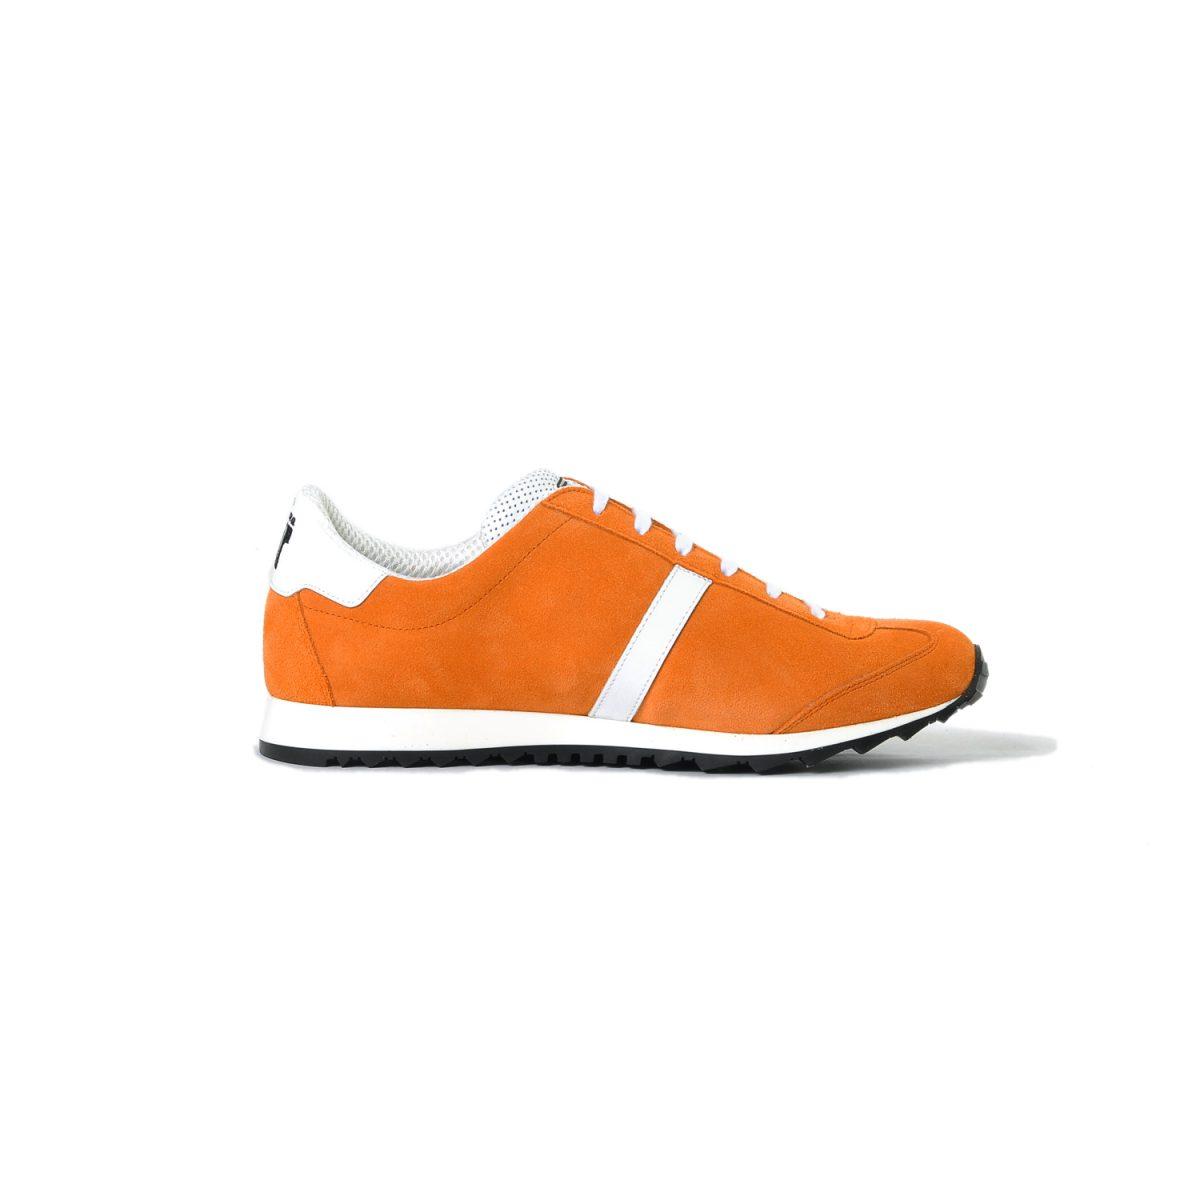 Tisza cipő - Martfű - Narancs-fehér